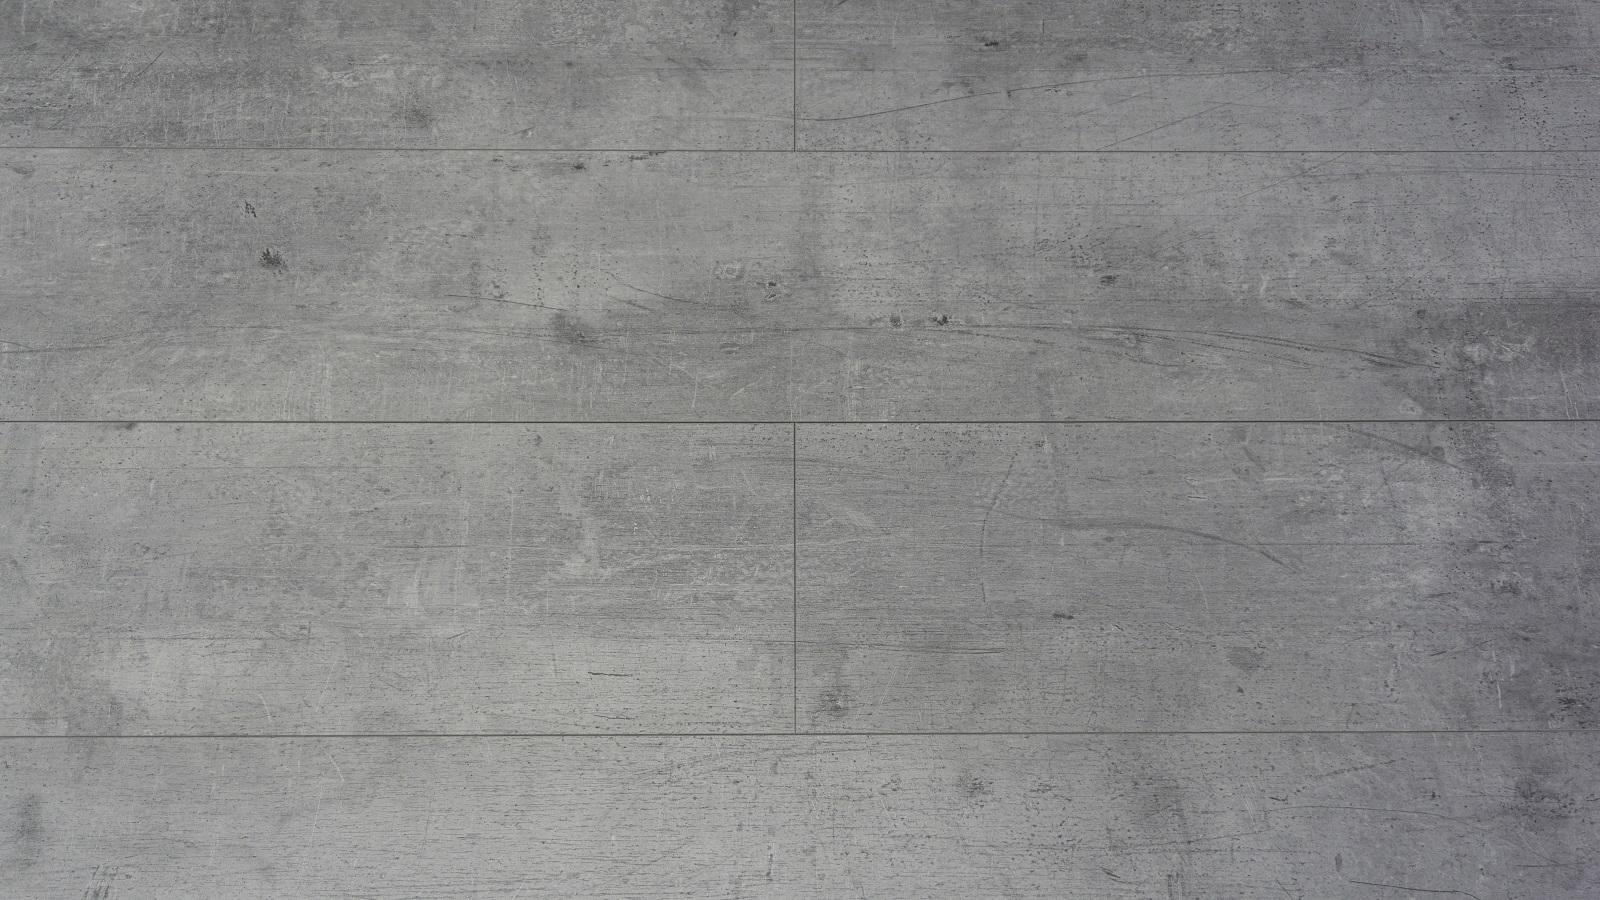 бетон миллениум рф